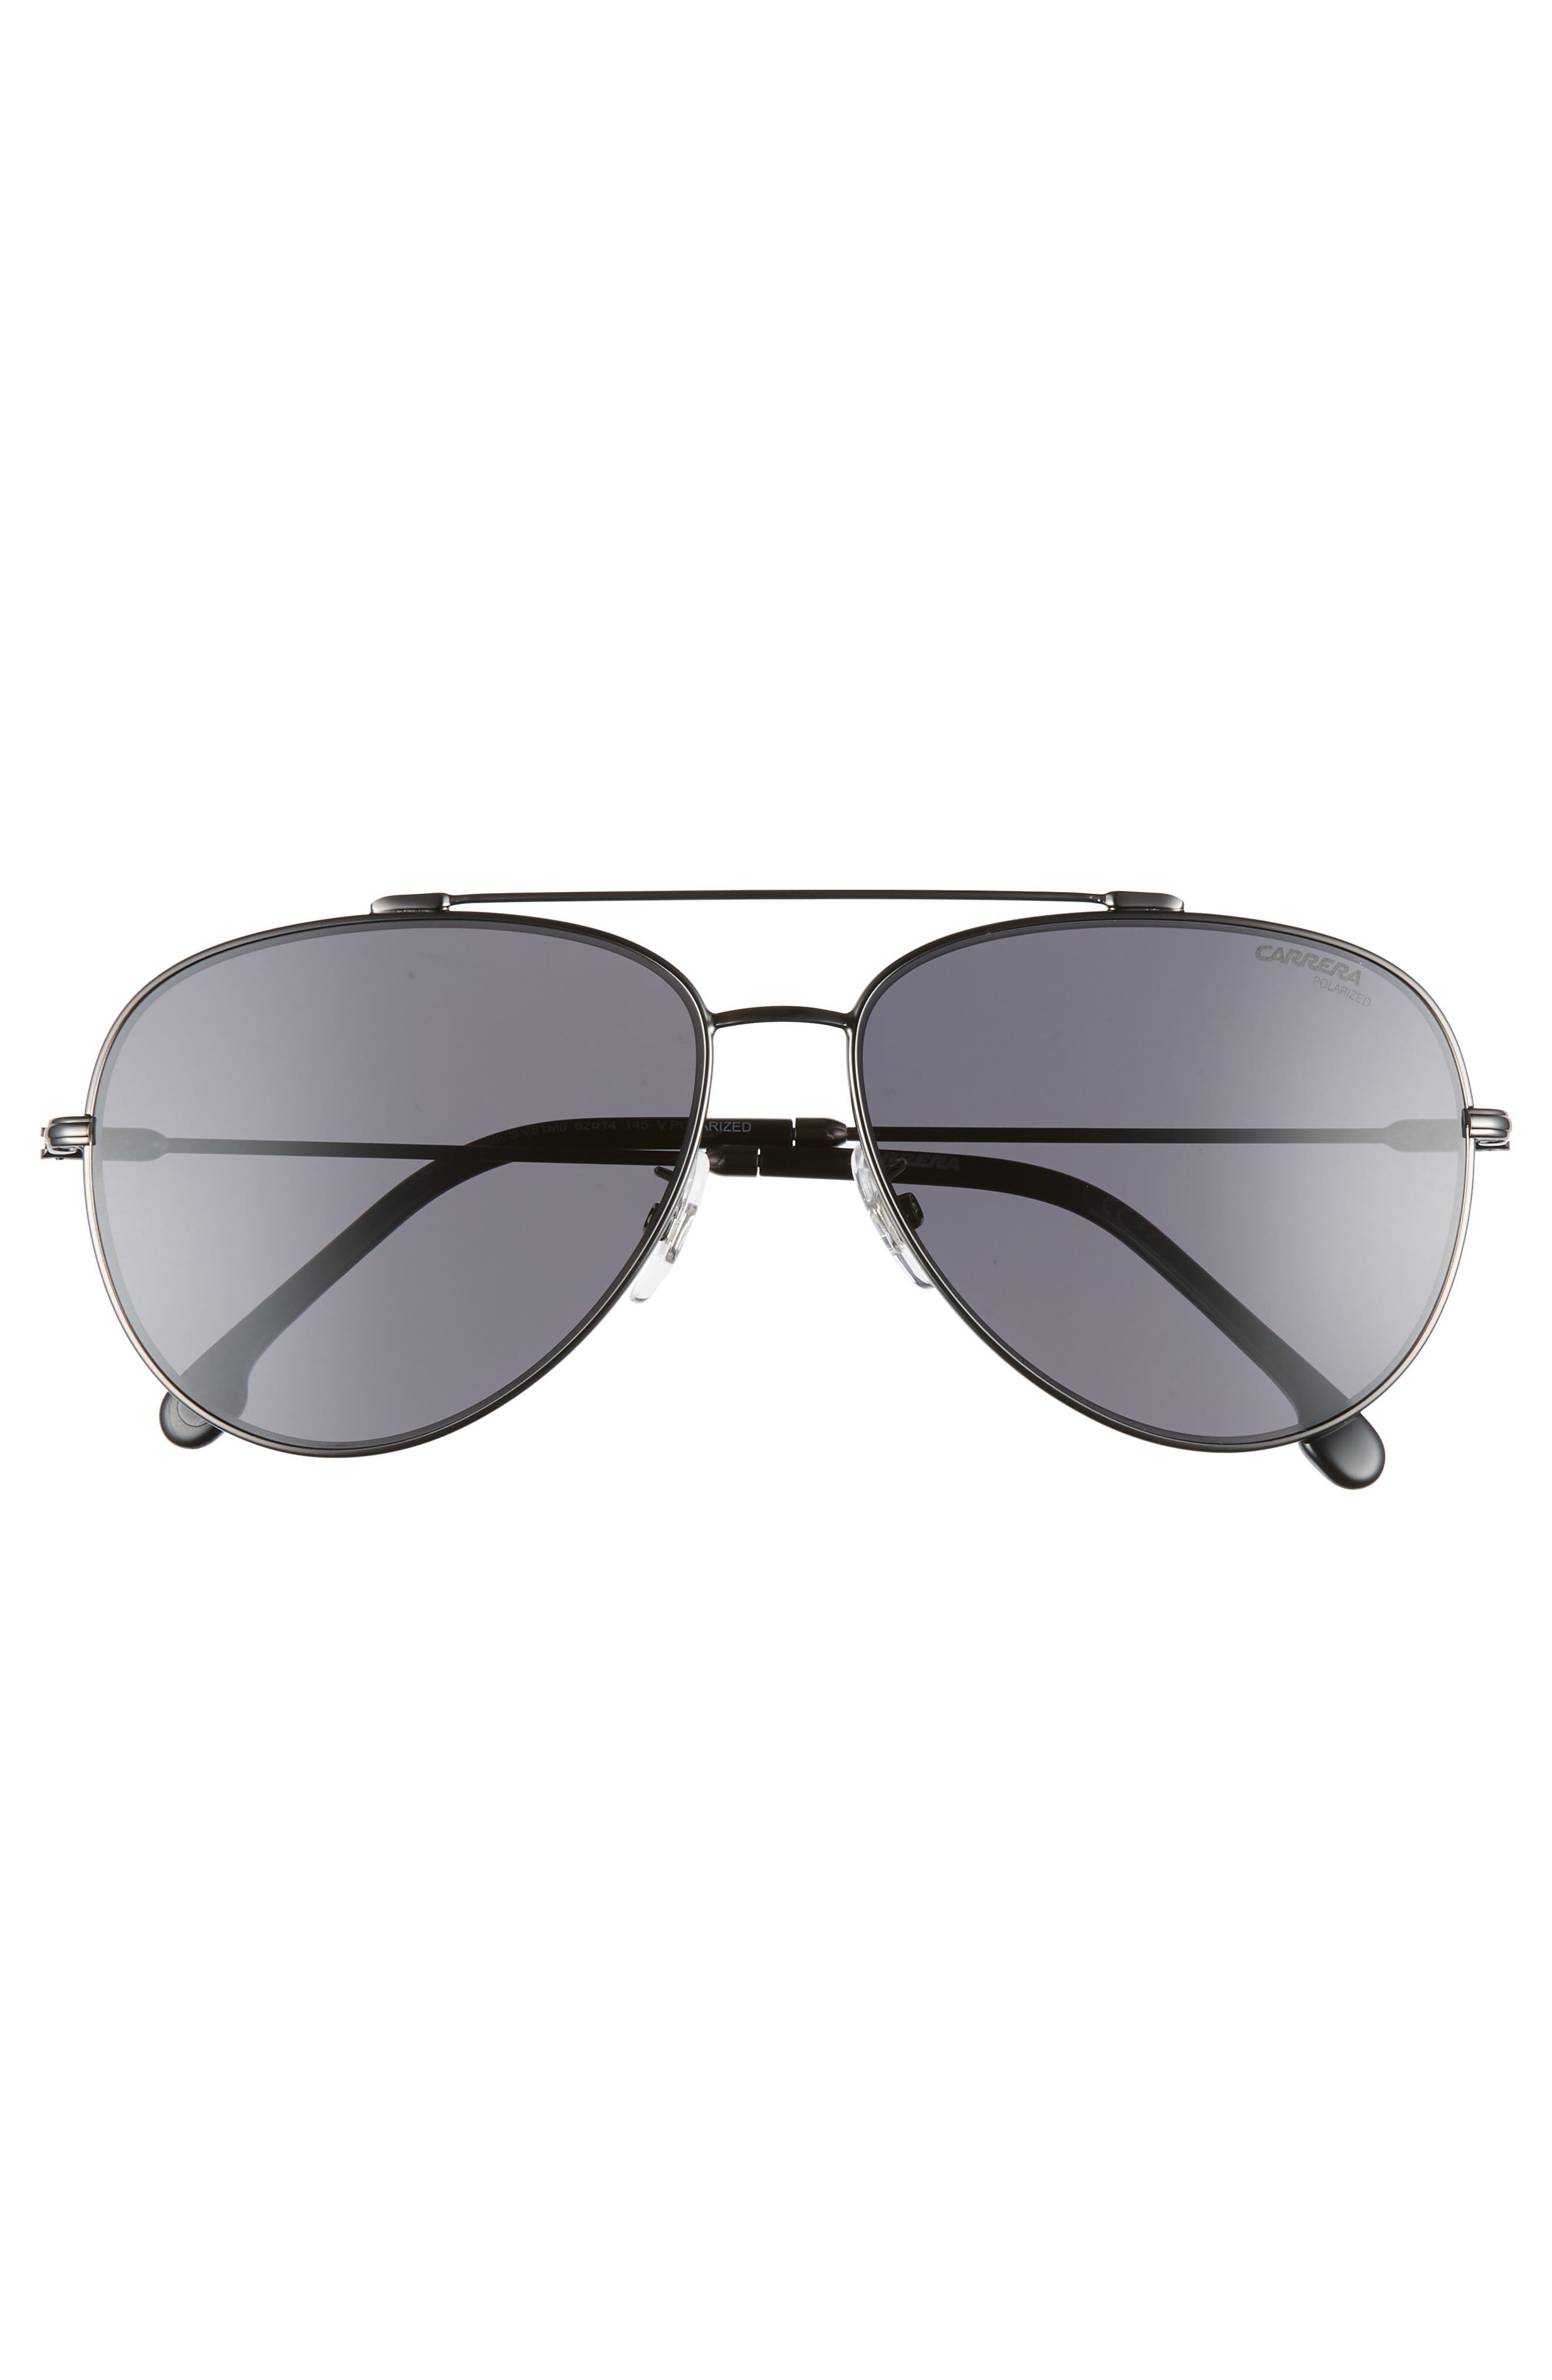 62mm Polarized Aviator Sunglasses,                             Alternate thumbnail 2, color,                             DARK RUTHENIUM/ BLACK